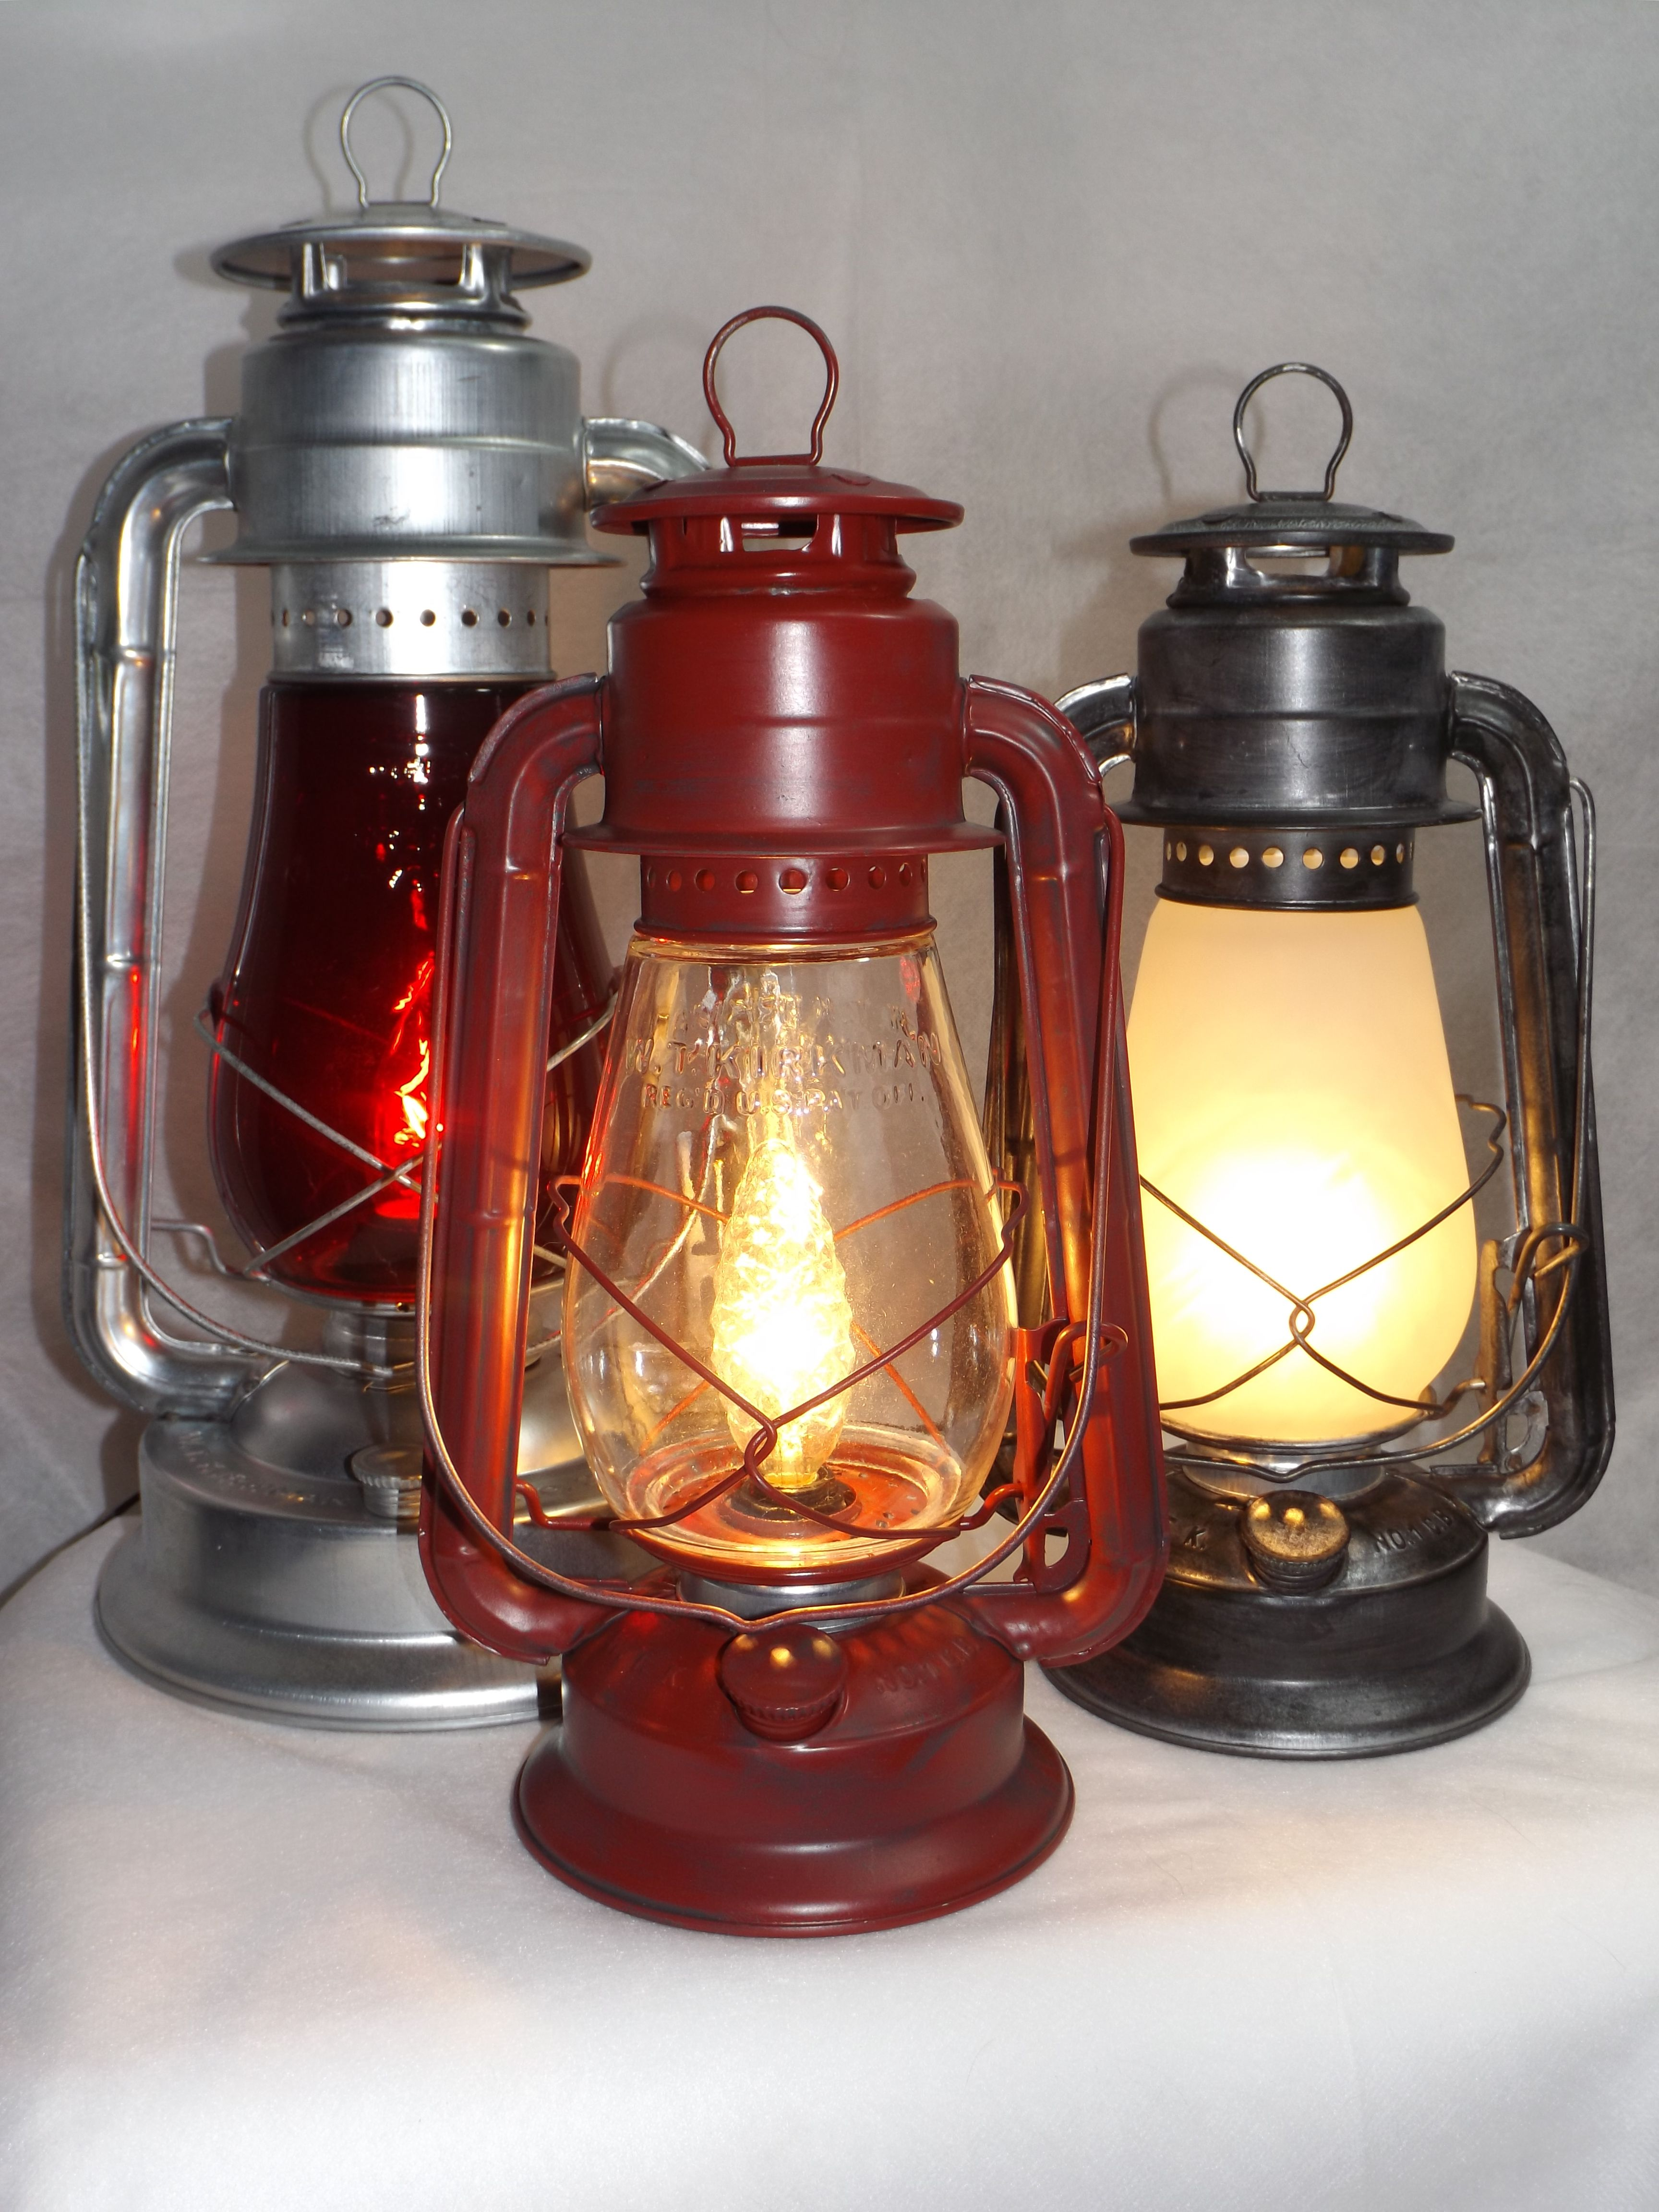 Just Plug Them In And Enjoy Www Bigrocklanterns Com Electric Lanterns Lantern Lamp Lantern Lights